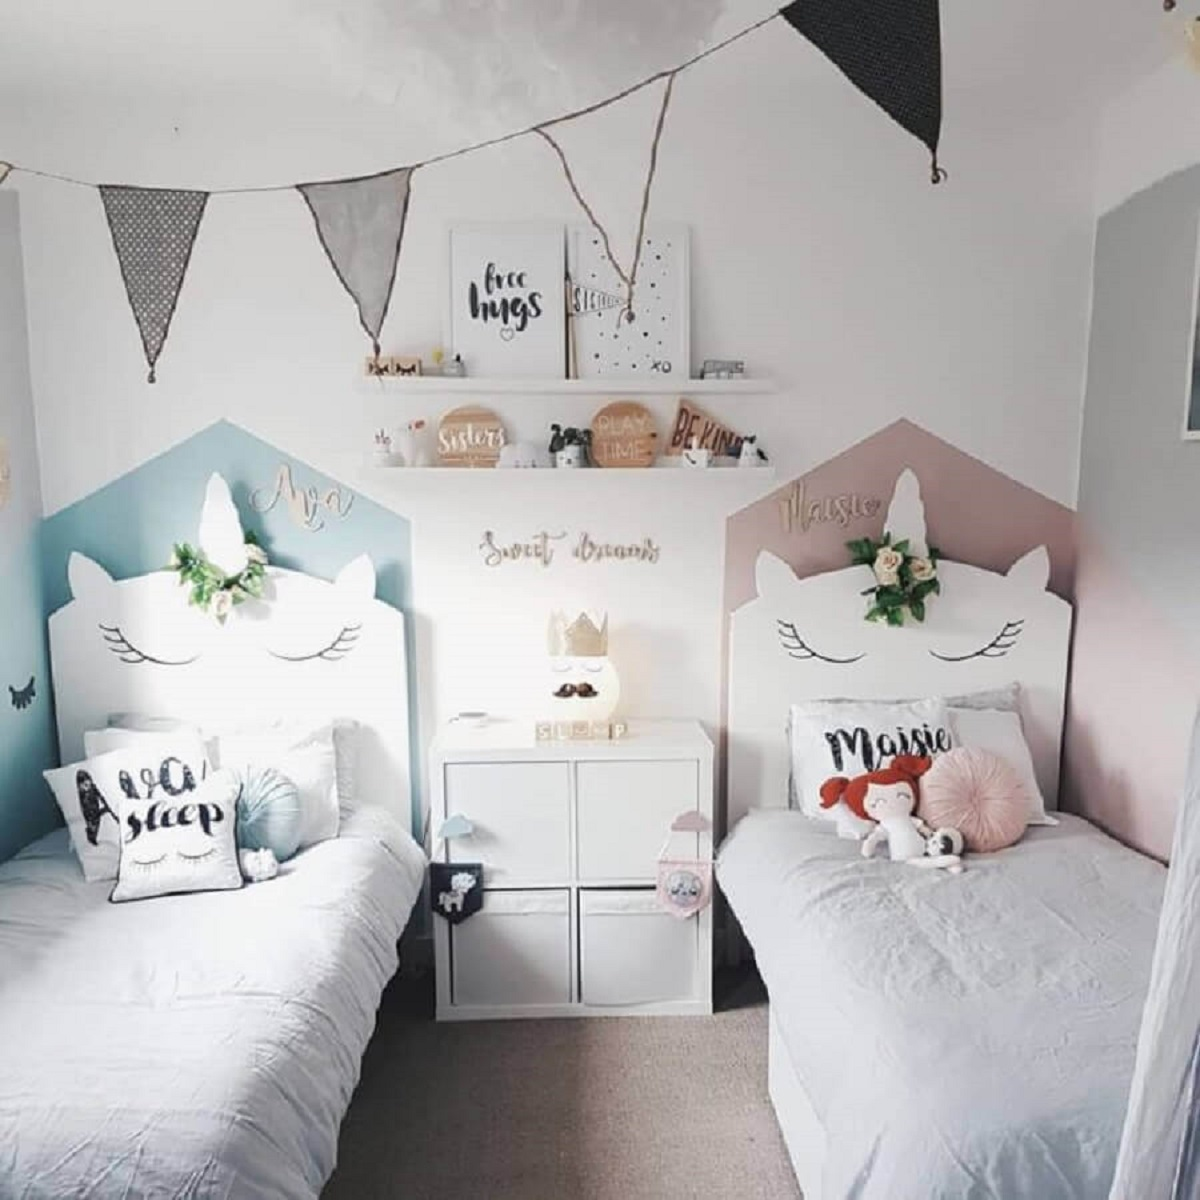 unicorn room decorating ideas 5